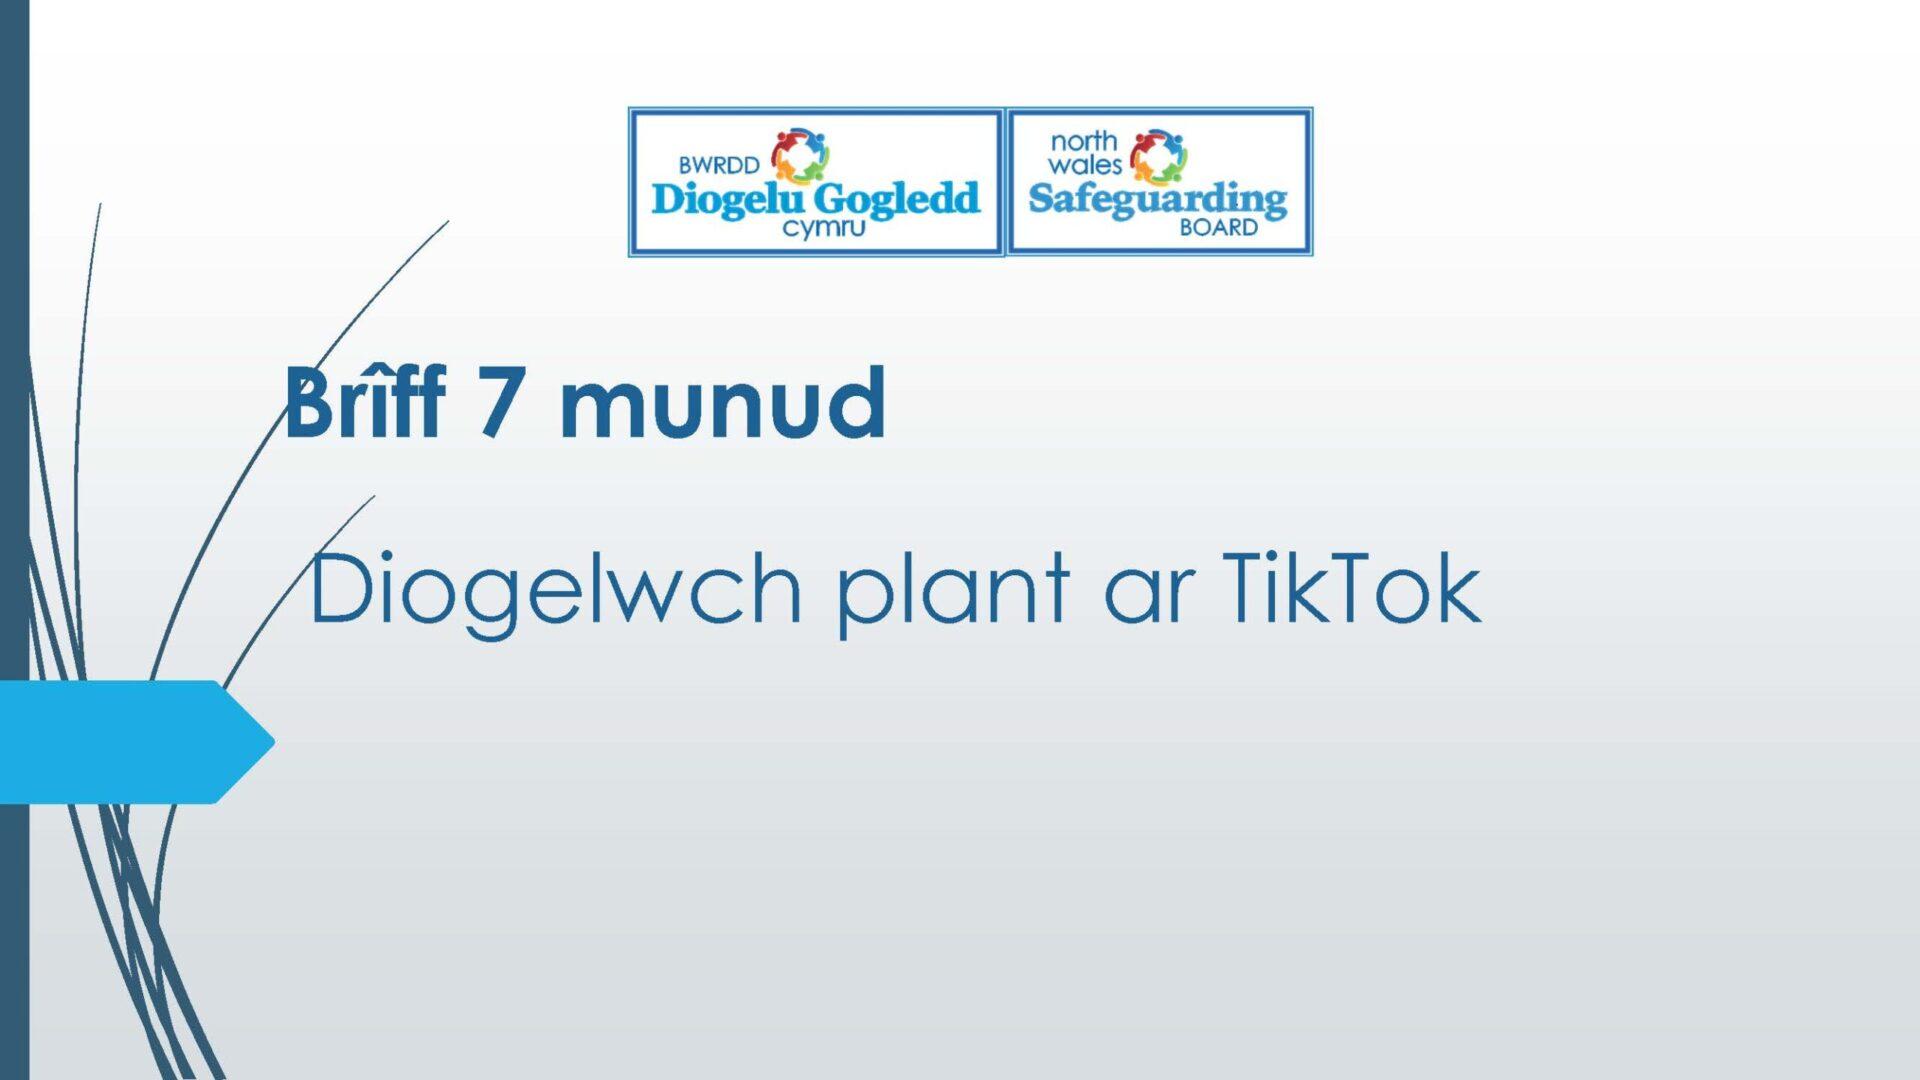 Diogelwch plant ar TikTok